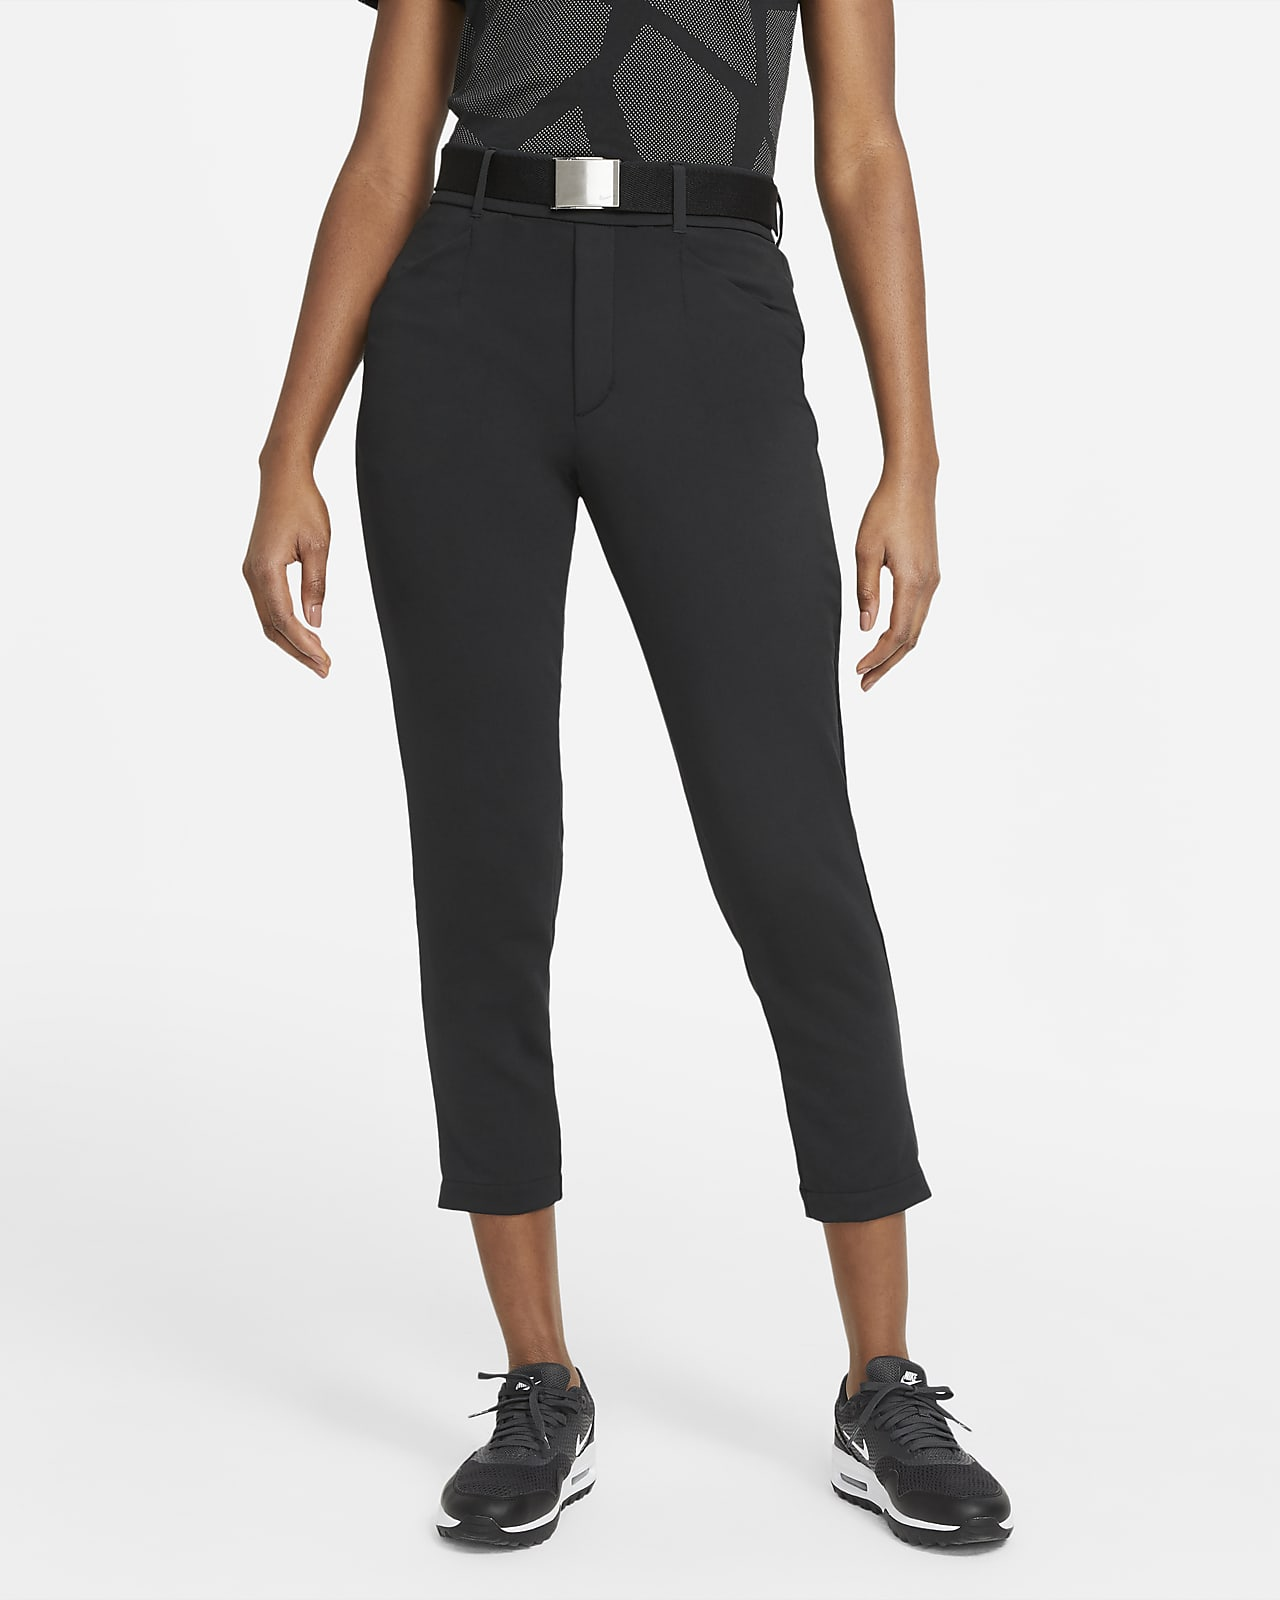 Pantalones de Golf de ajuste slim para mujer Nike Dri-FIT UV Ace